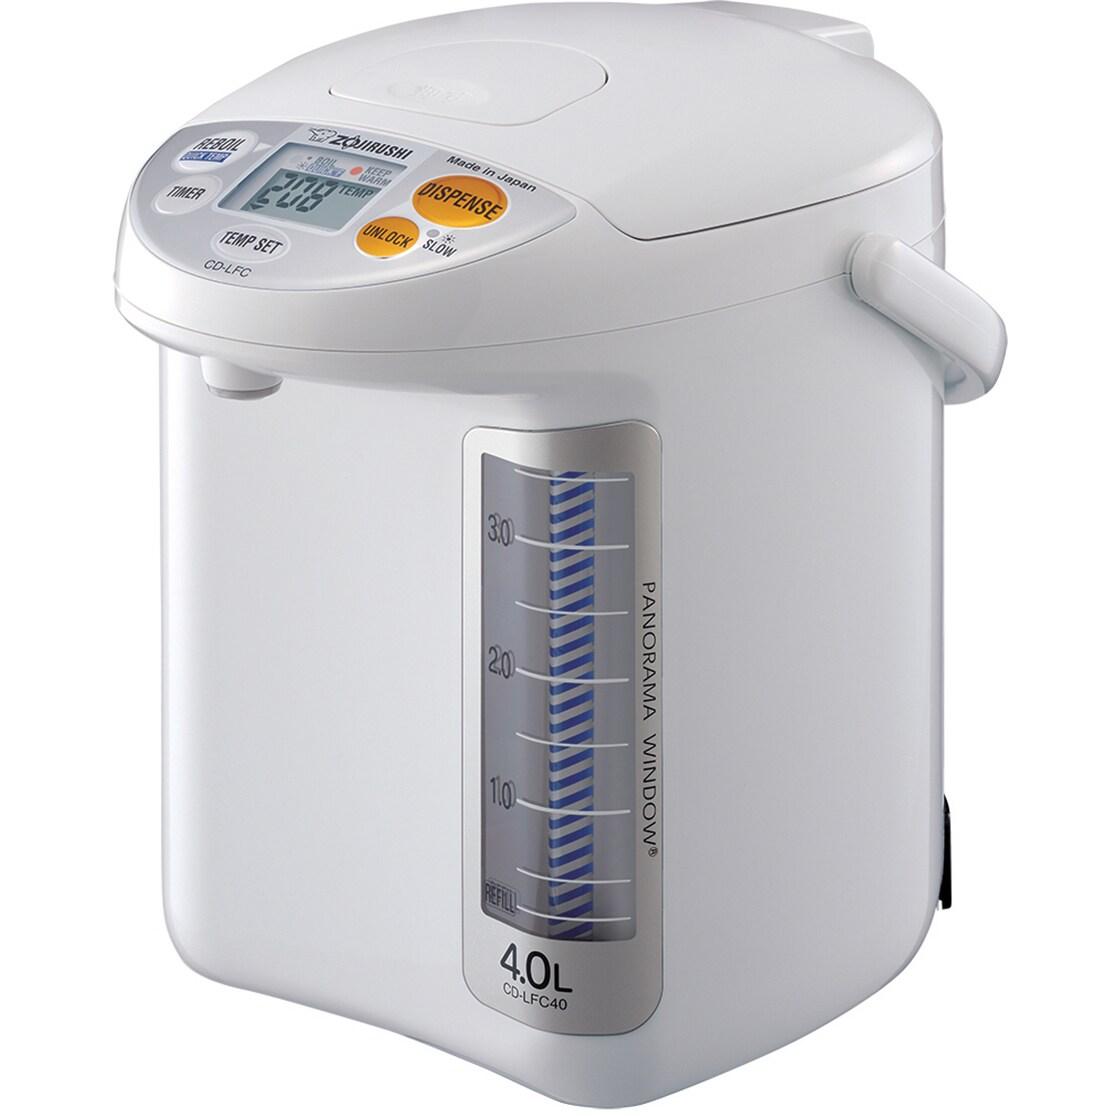 Zojirushi Panorama Micom Water Boiler & Warmer (3-liter S...